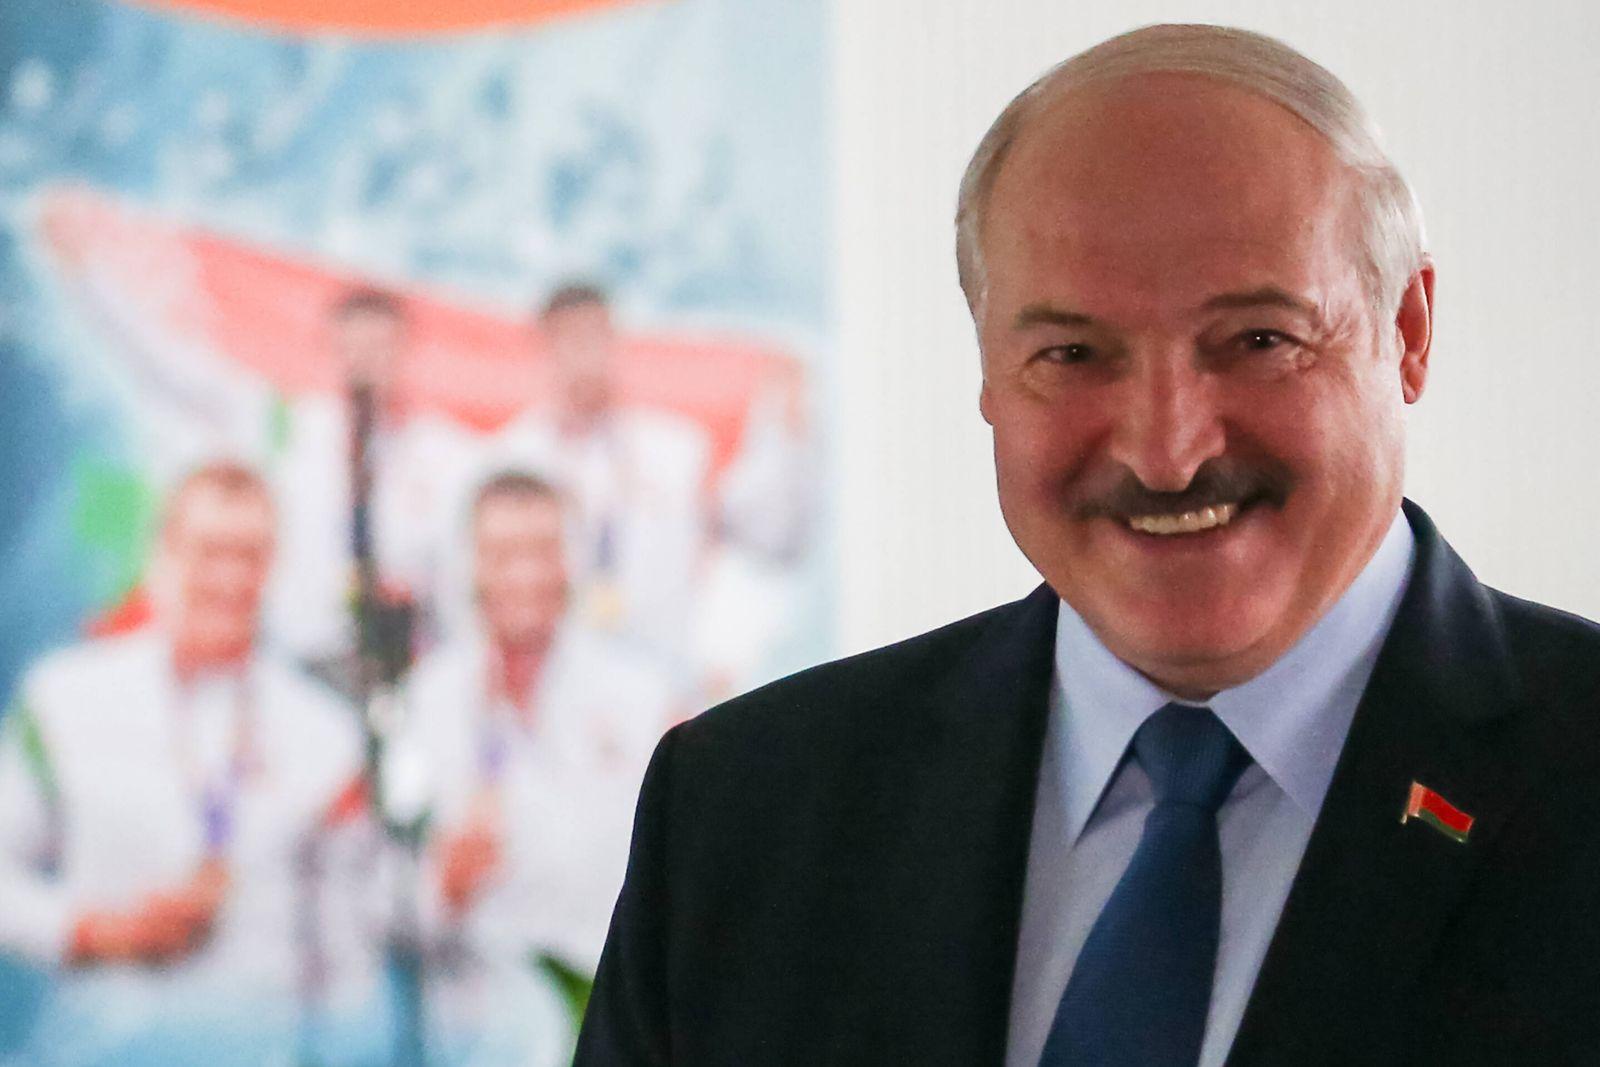 MINSK, BELARUS - AUGUST 9, 2020: Belarus Incumbent President Alexander Lukashenko smiles as he votes in the 2020 Belaru